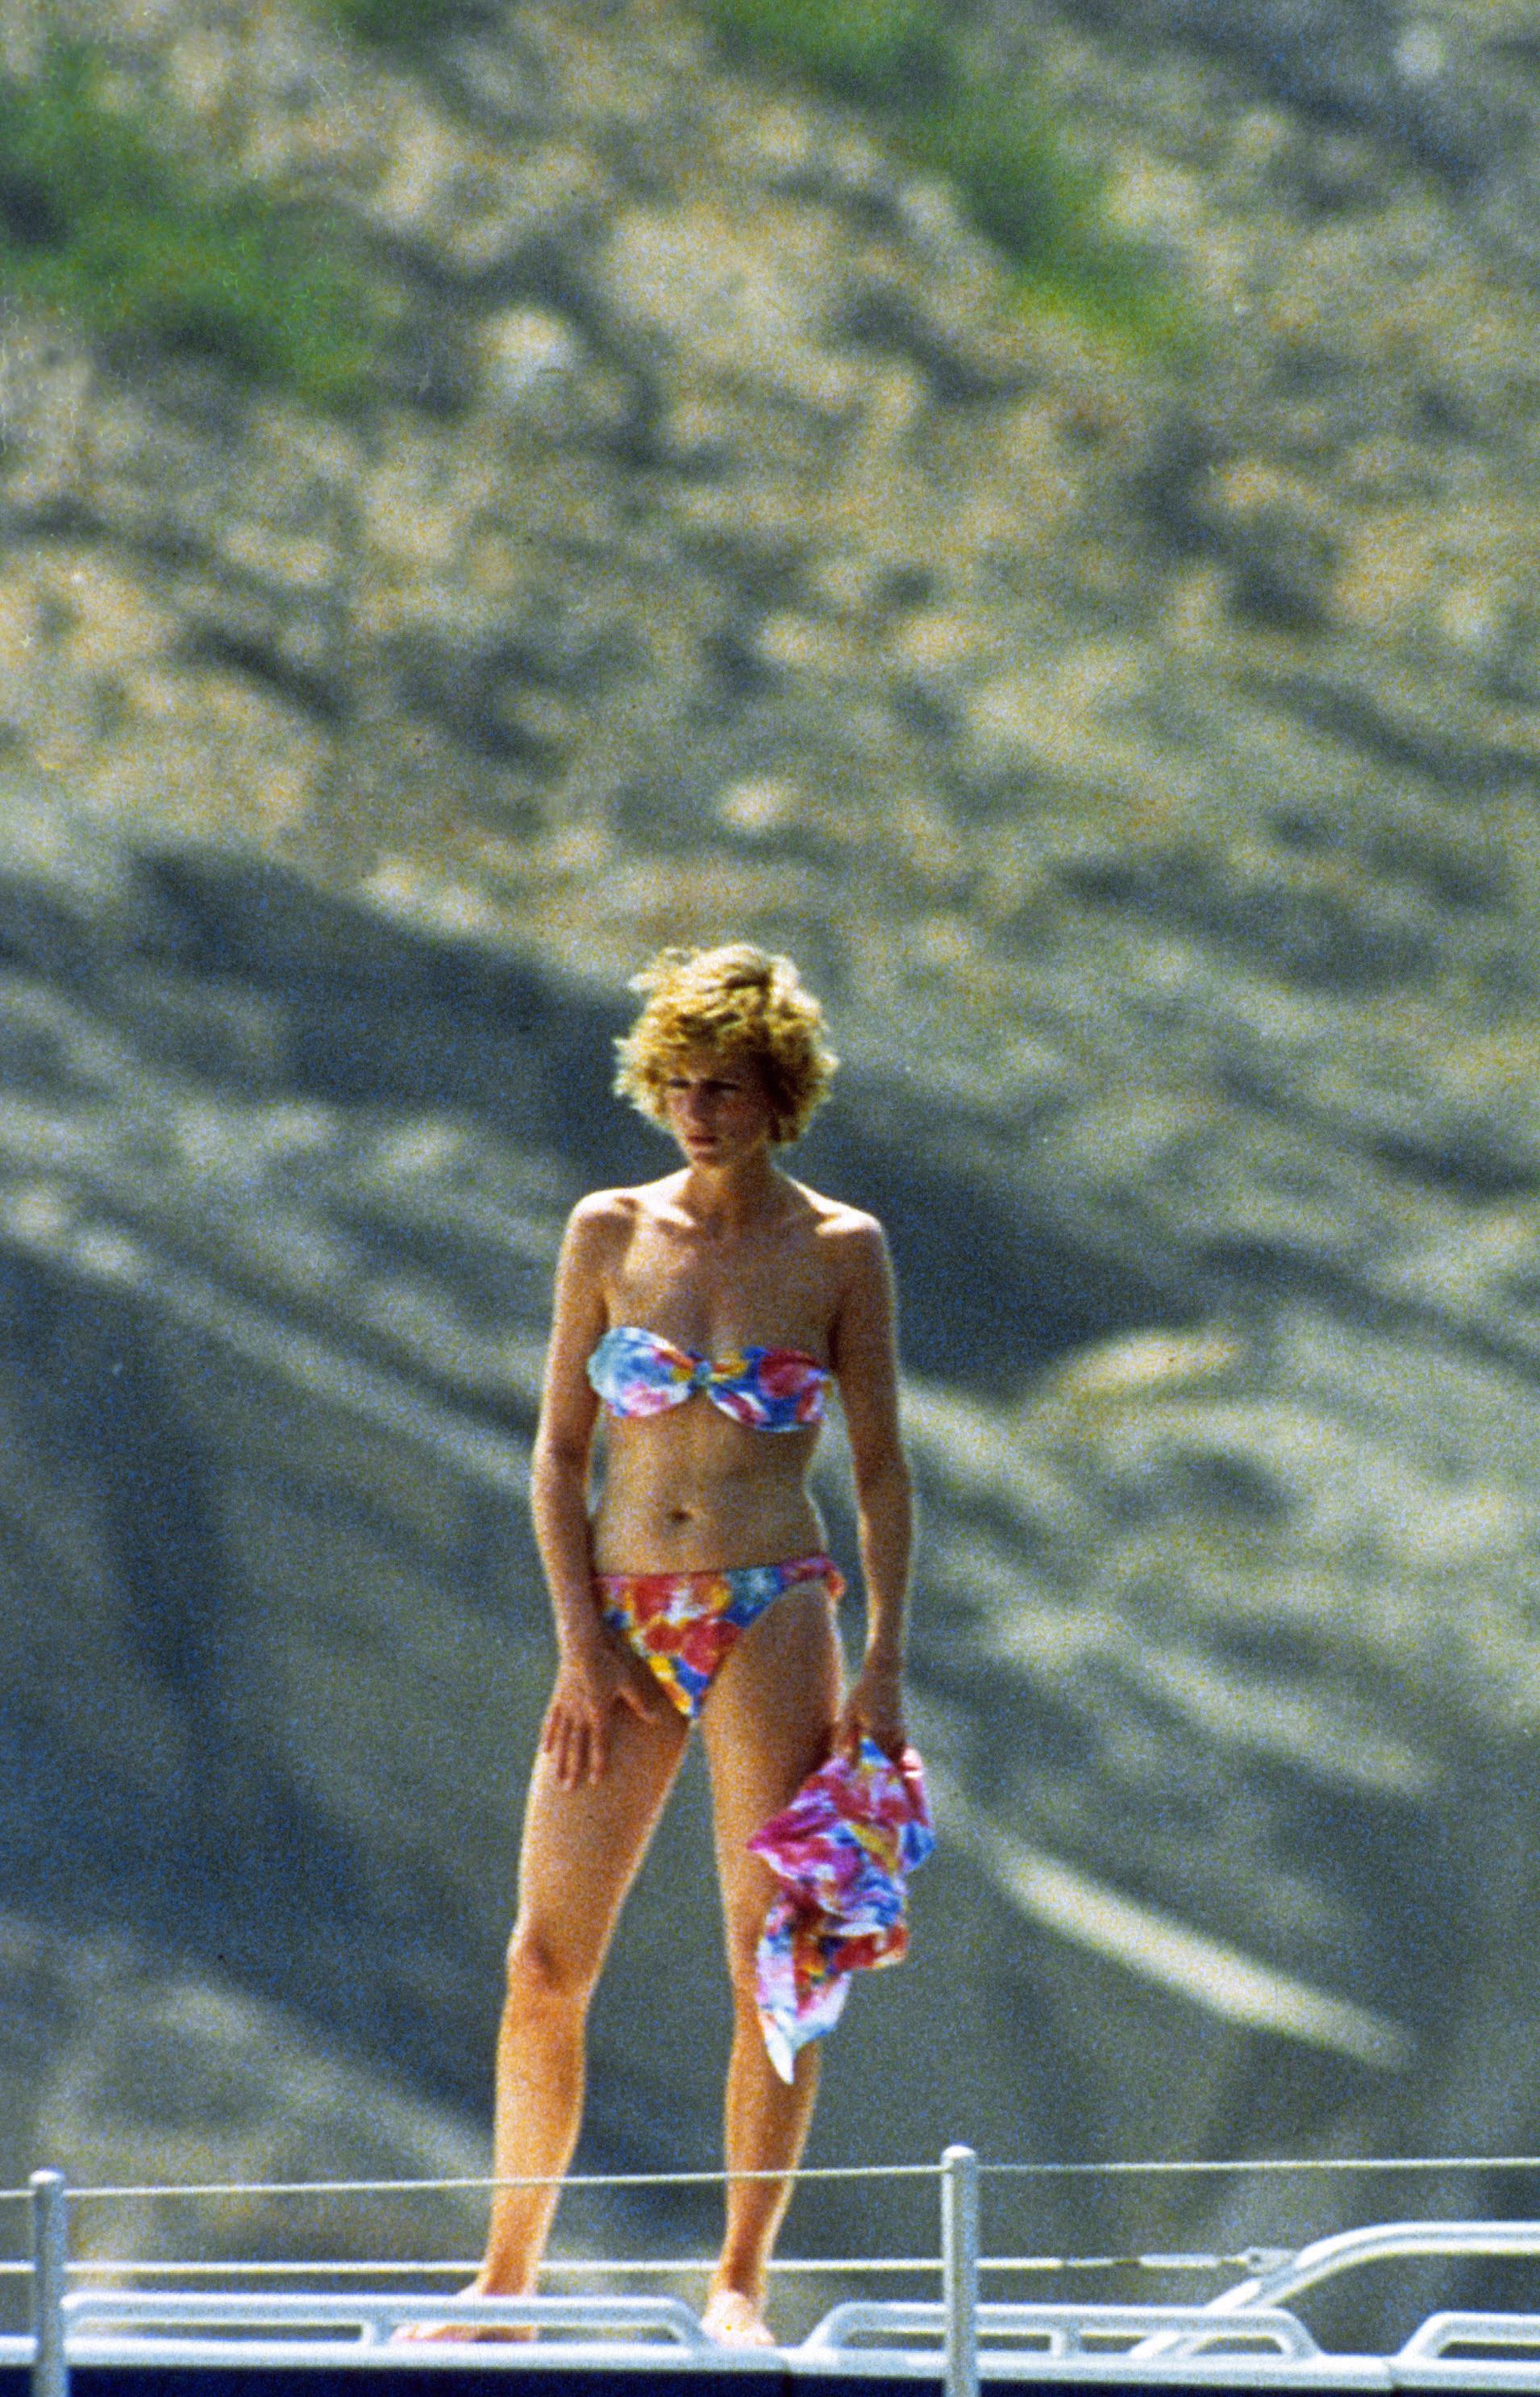 Princesa diana biquini bikini.jpg